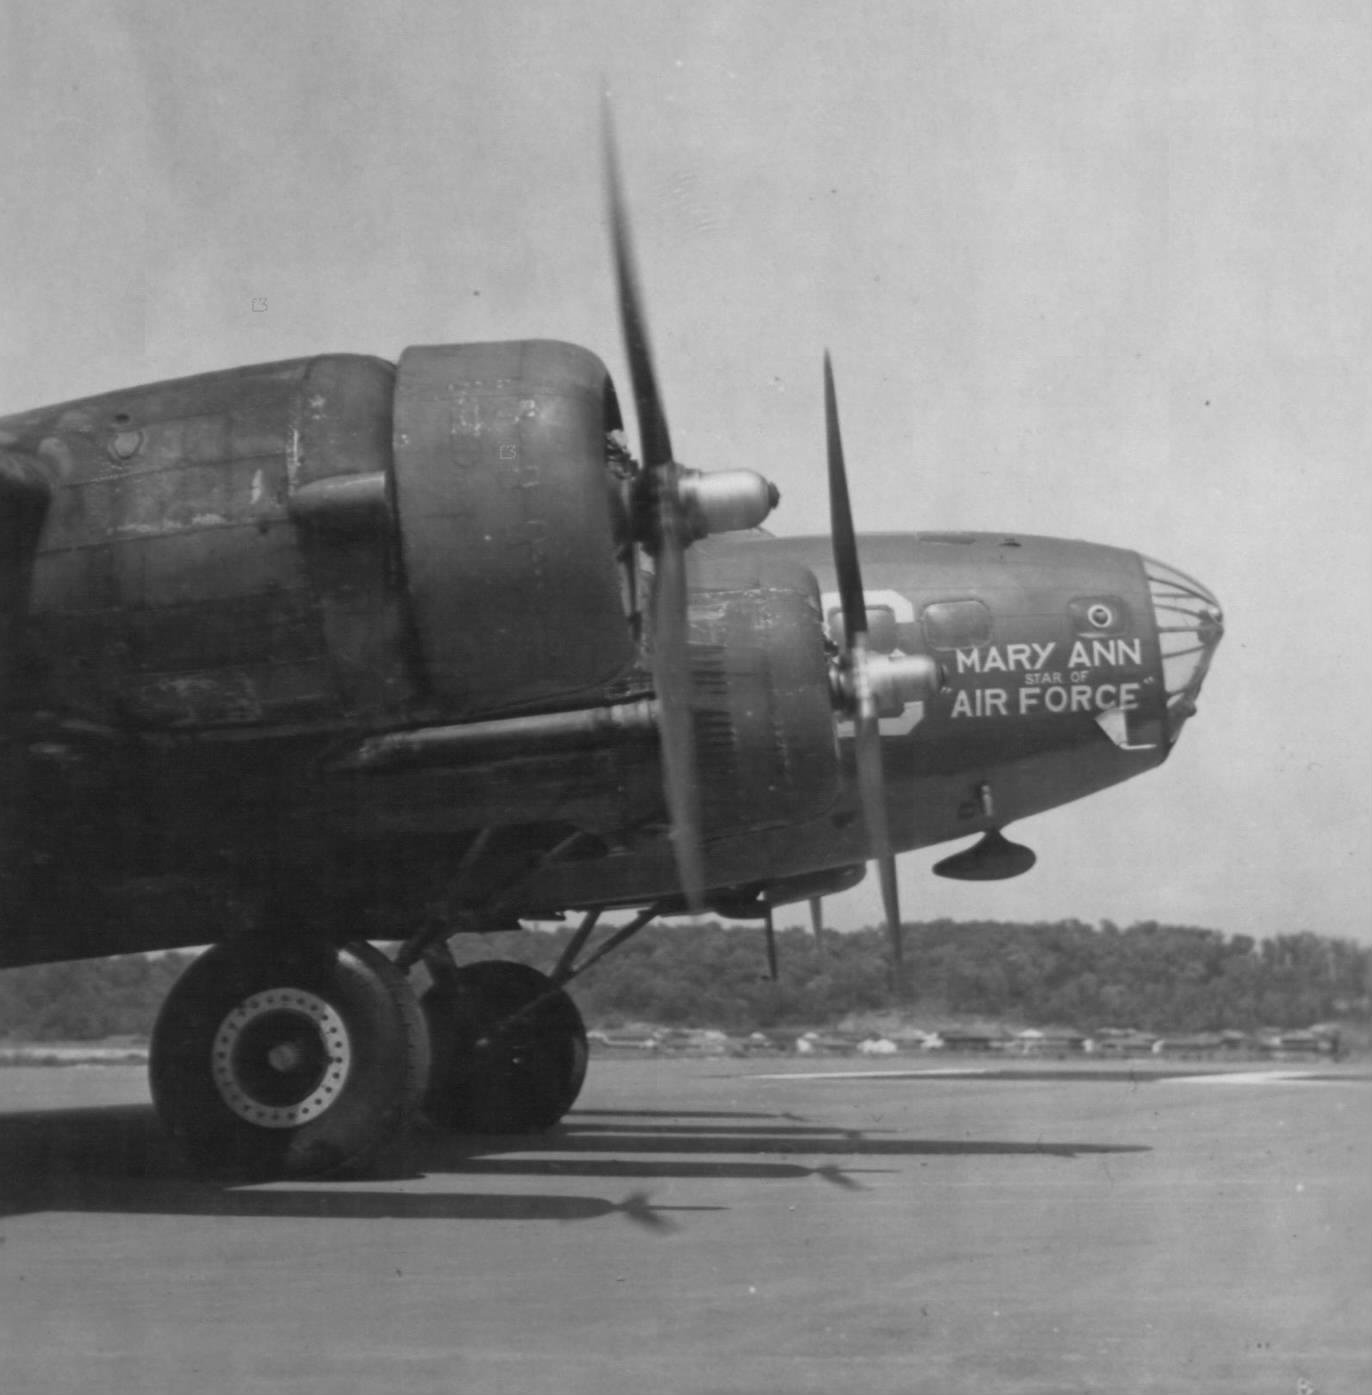 B-17 #38-584